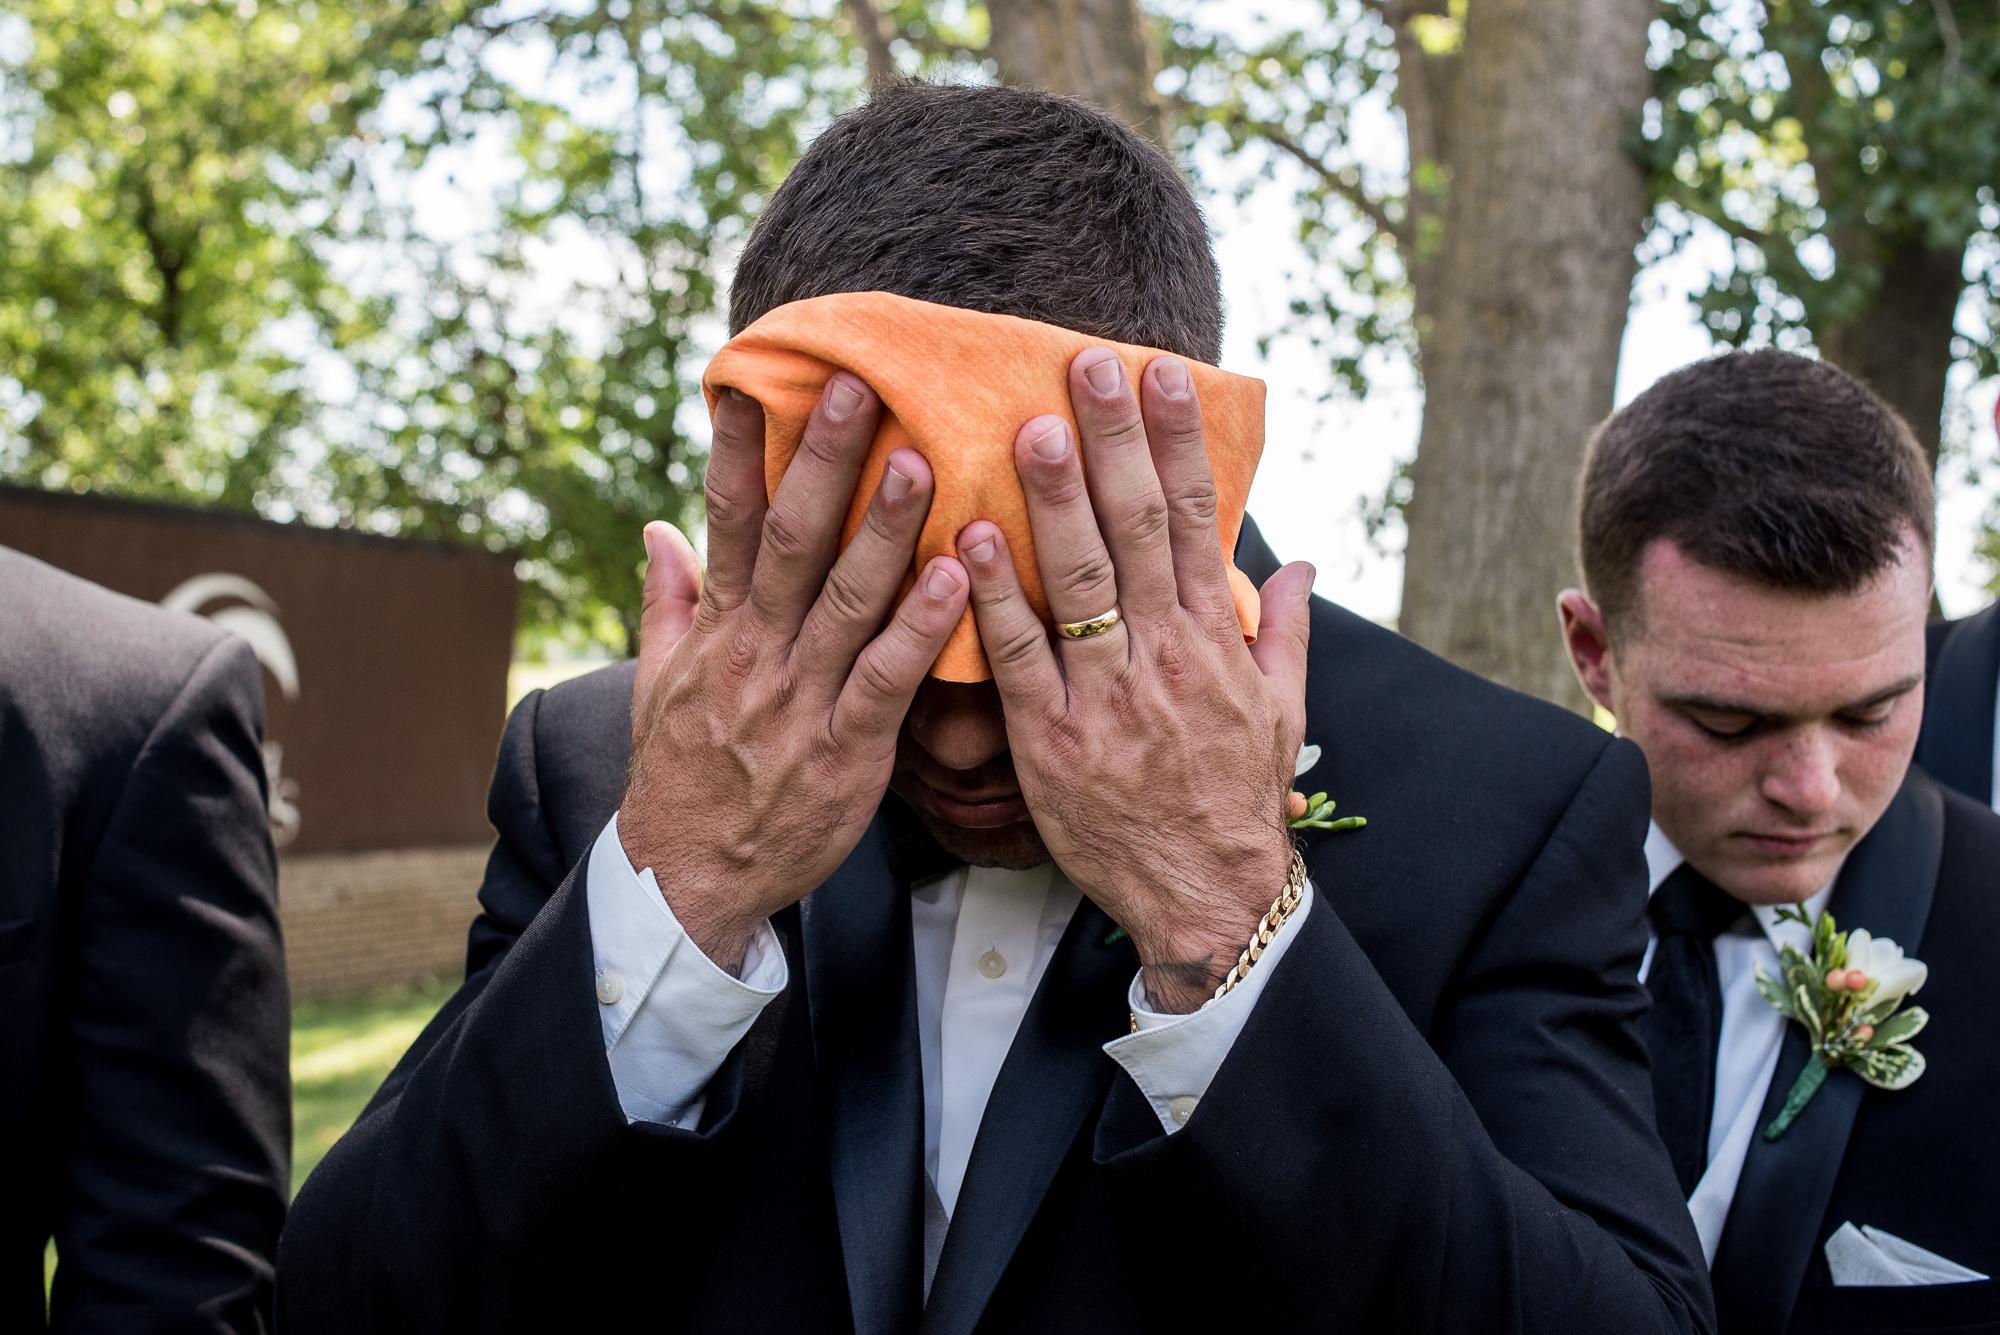 DAKOTA-DUNES-WEDDING-SOUTH-DAKOTA-WEDDING-PHOTOGRAPHER-0008.jpg